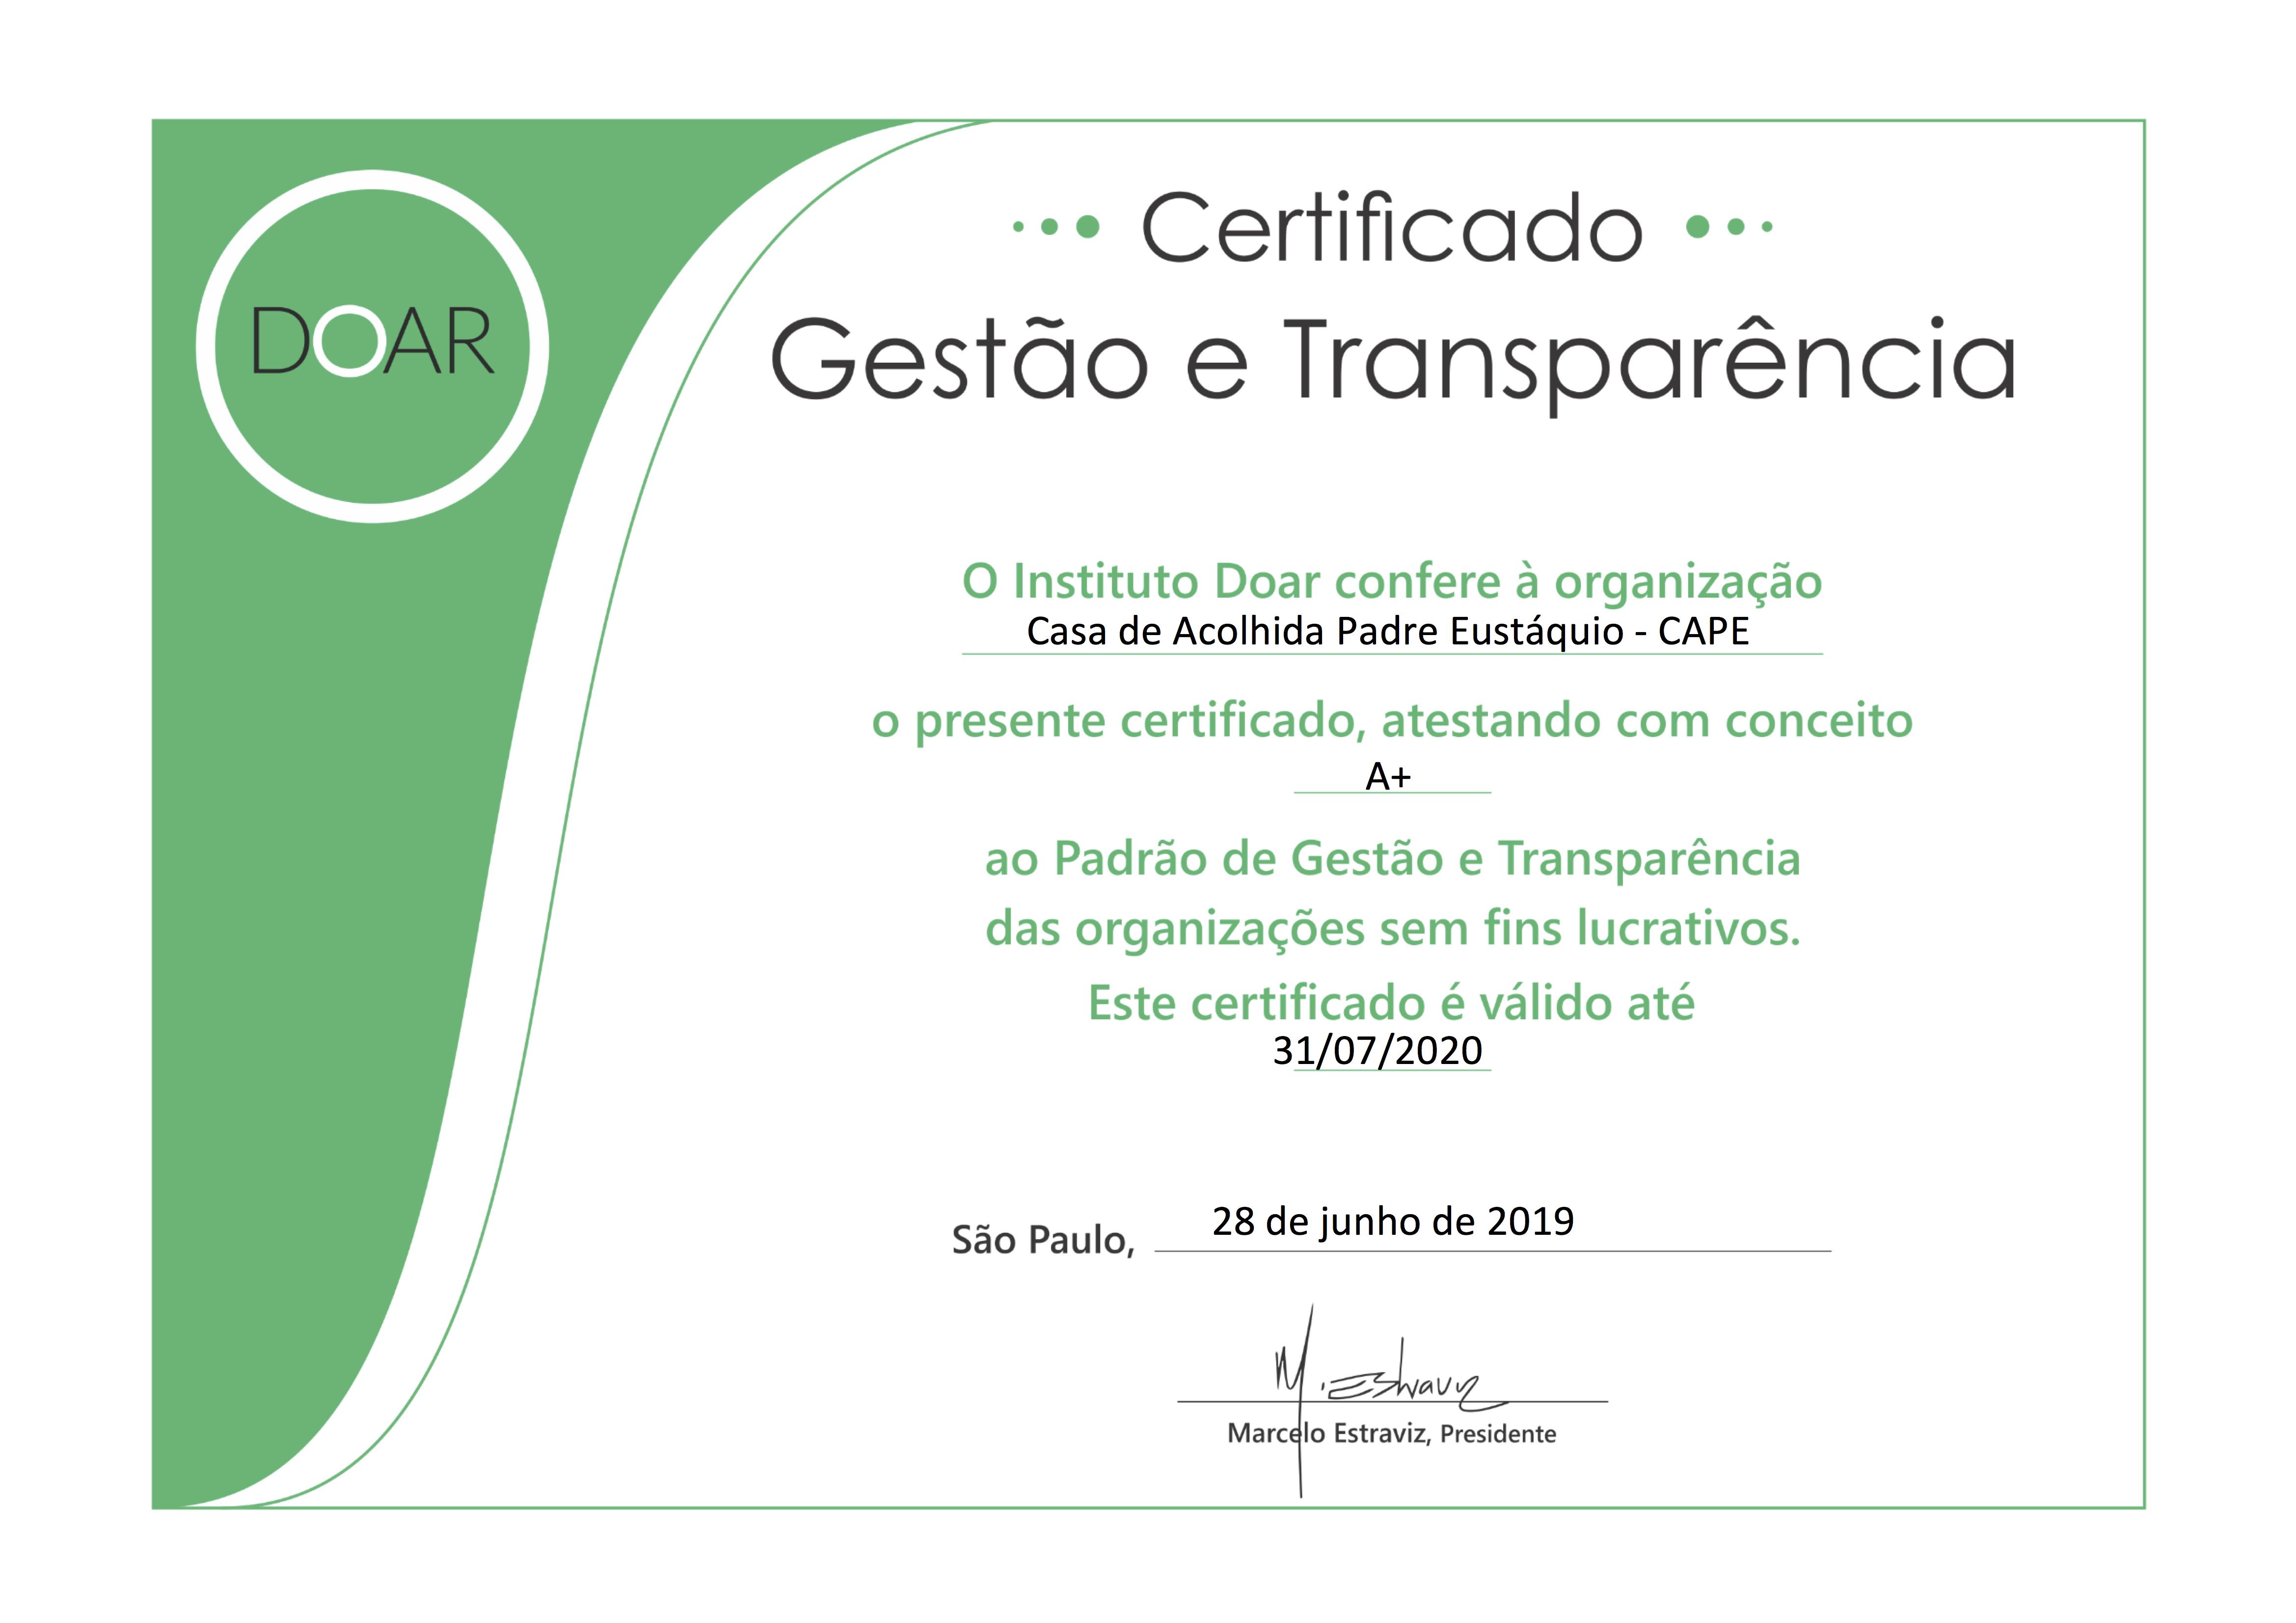 Certificado Doar, conceito A+ CAPE 2019